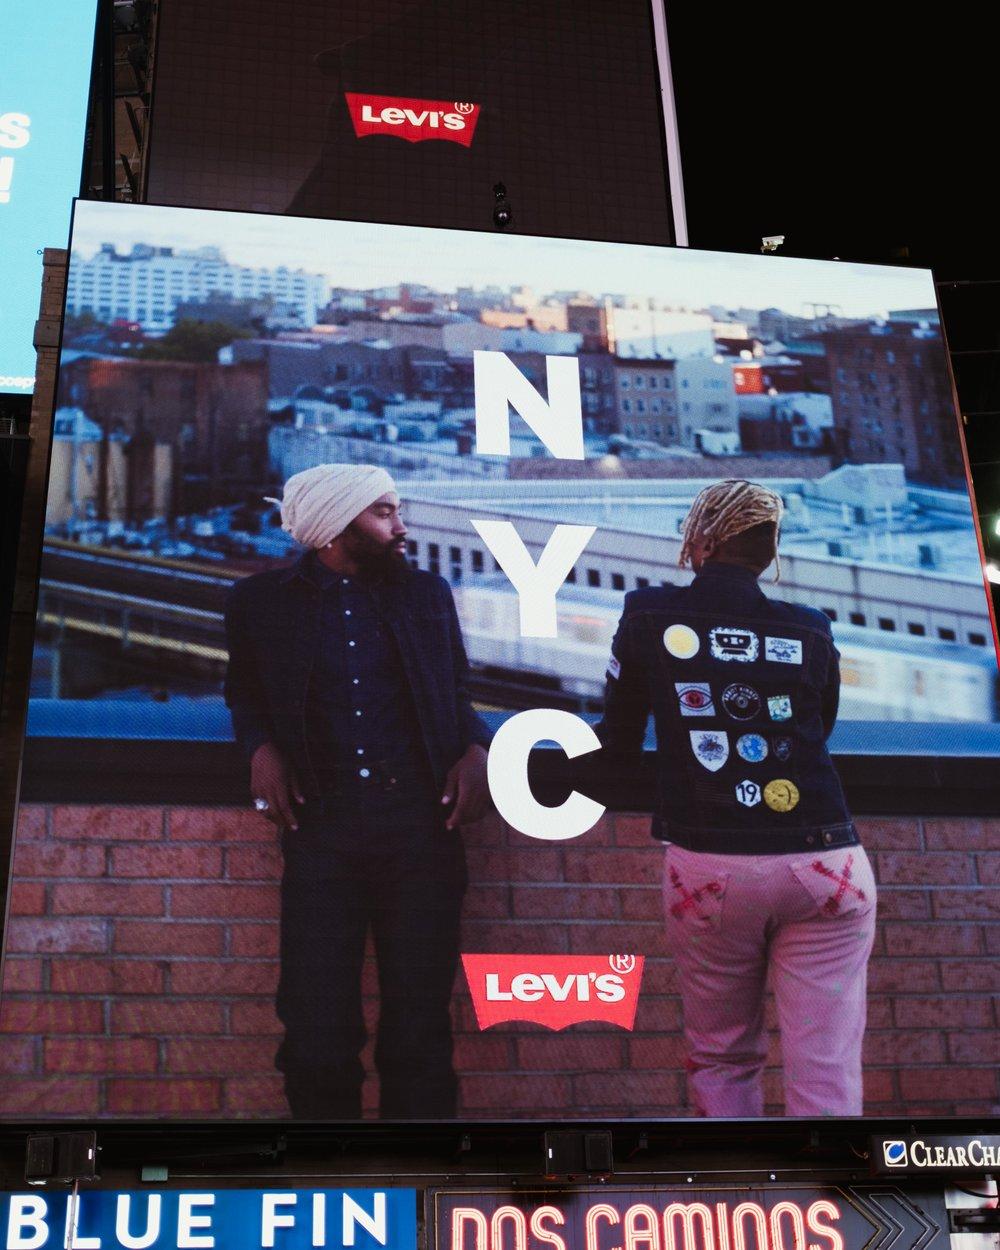 New york street photography (17 of 58).jpg